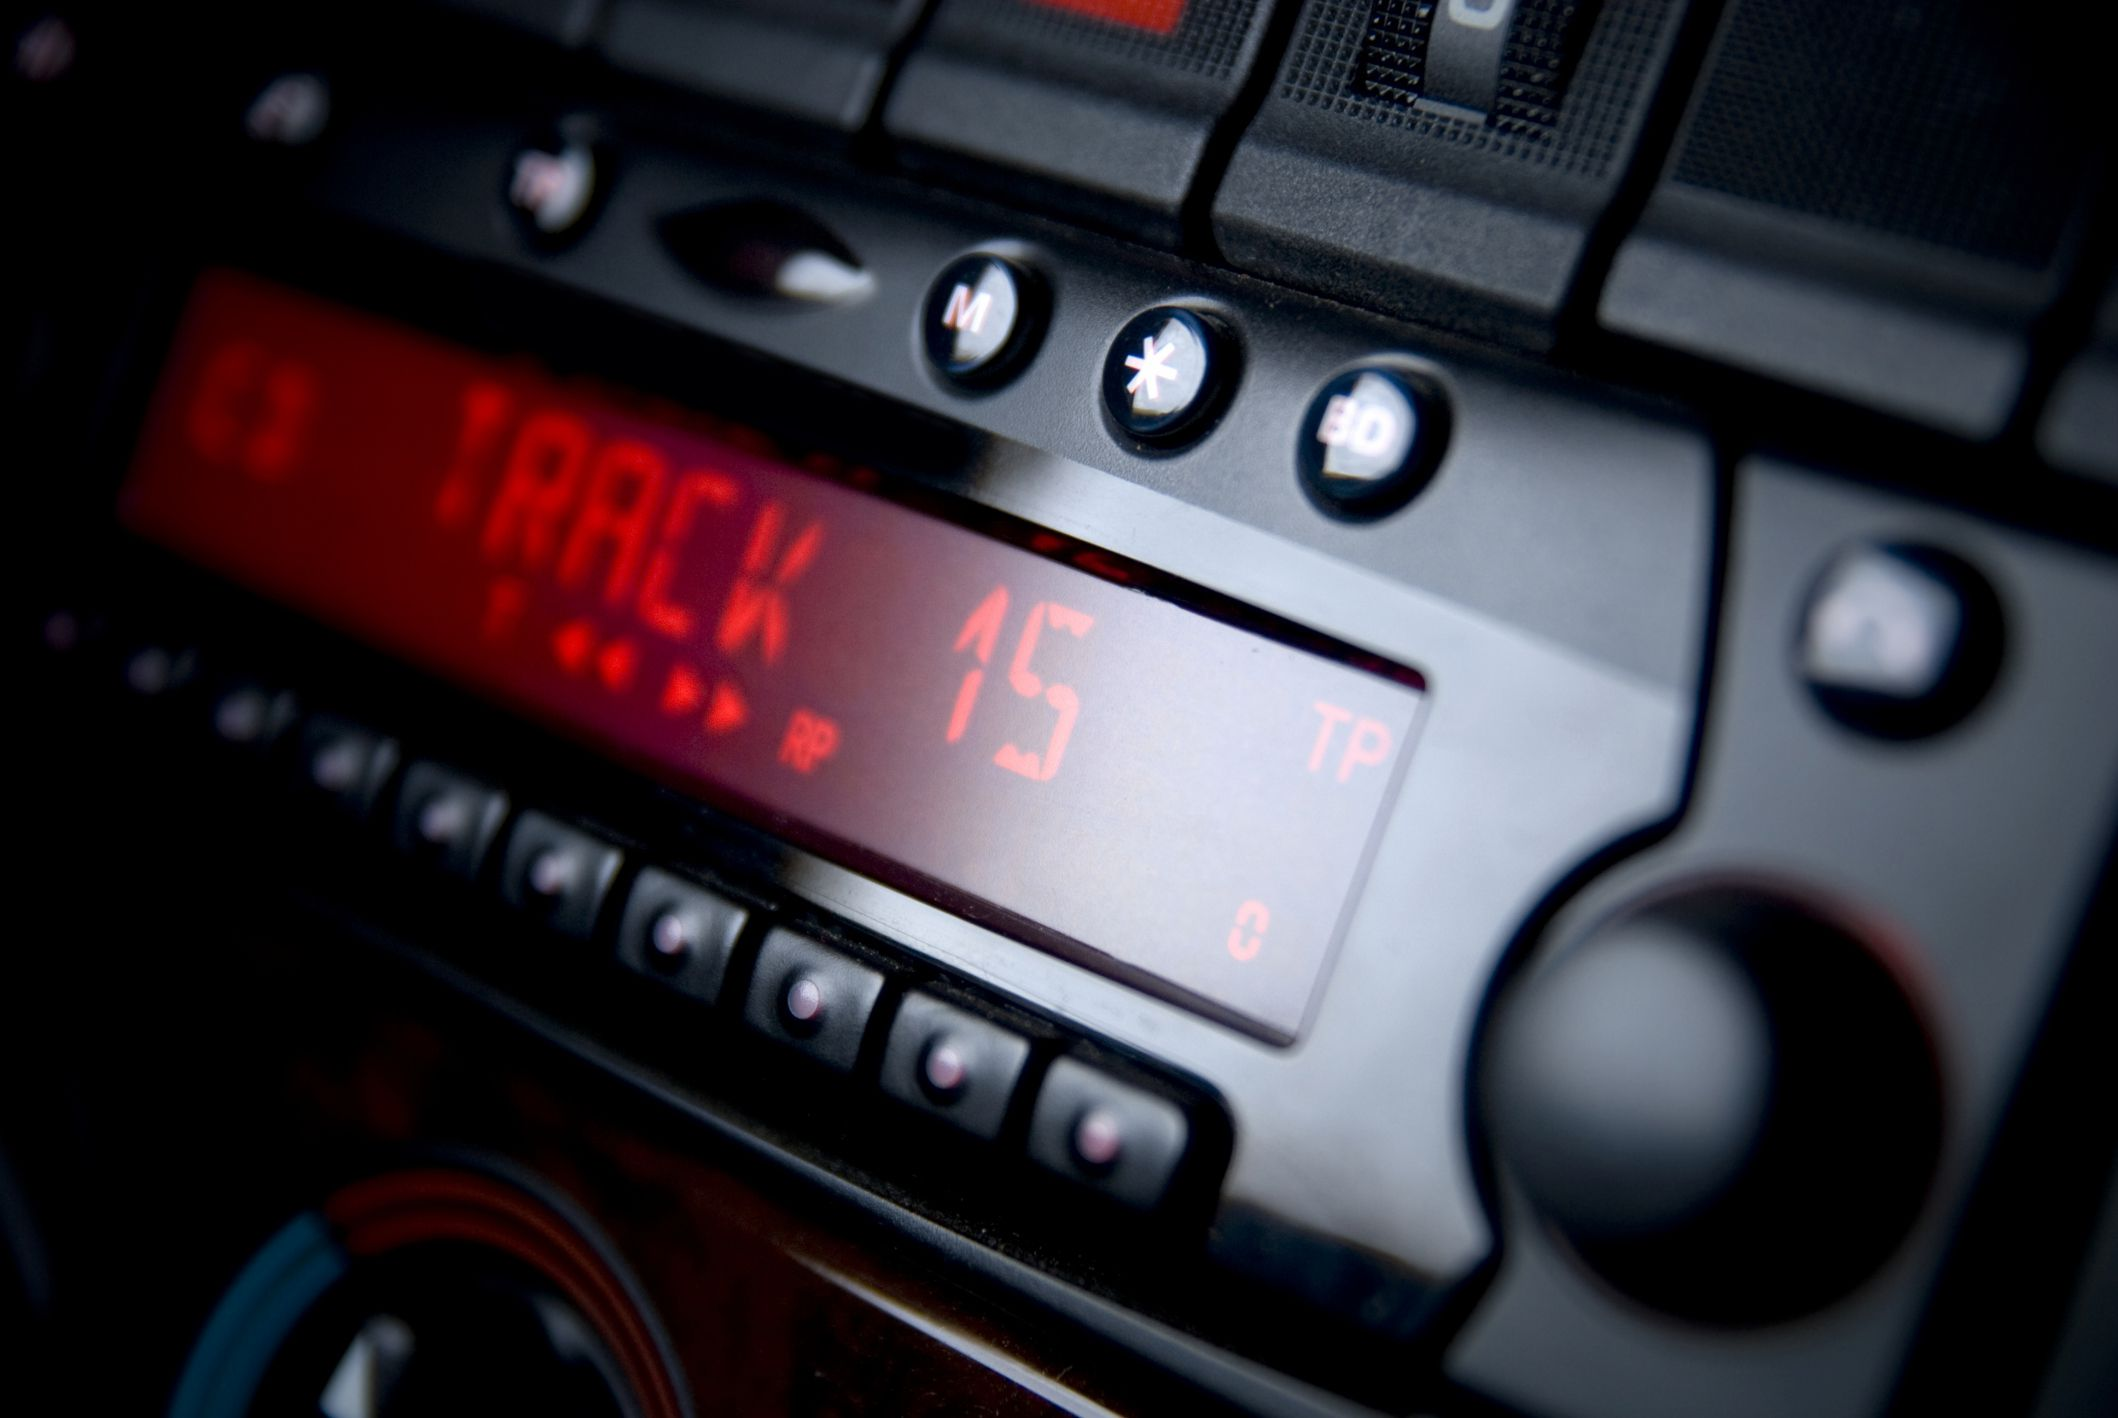 Car Key Won T Turn >> How to Fix a Car Radio That Won't Turn Off